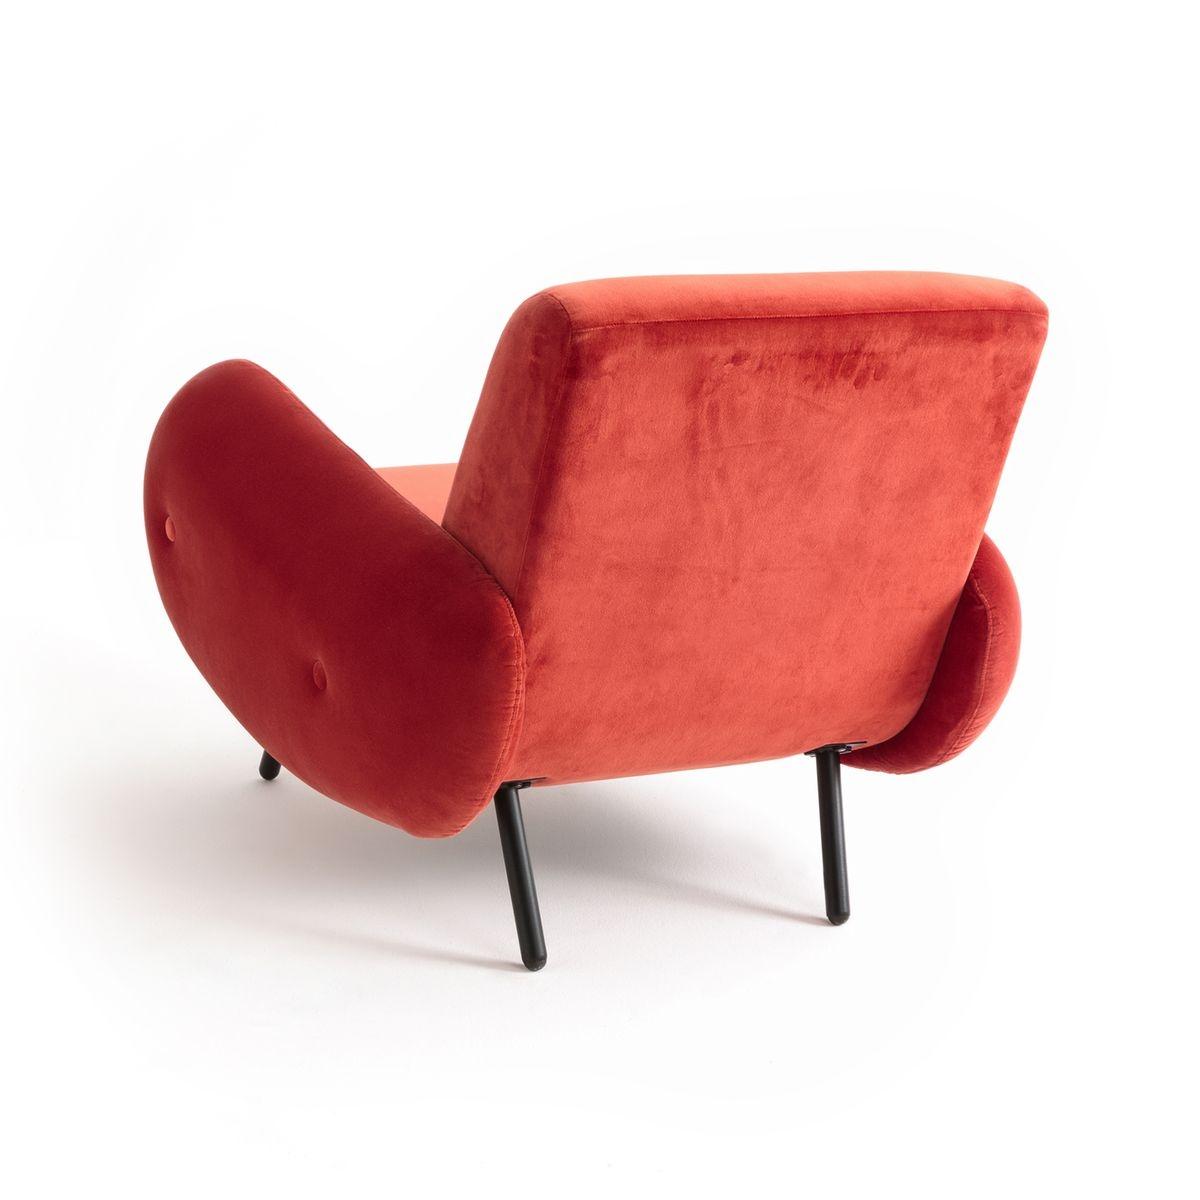 fauteuil velours vintage watford rouille interieurs. Black Bedroom Furniture Sets. Home Design Ideas